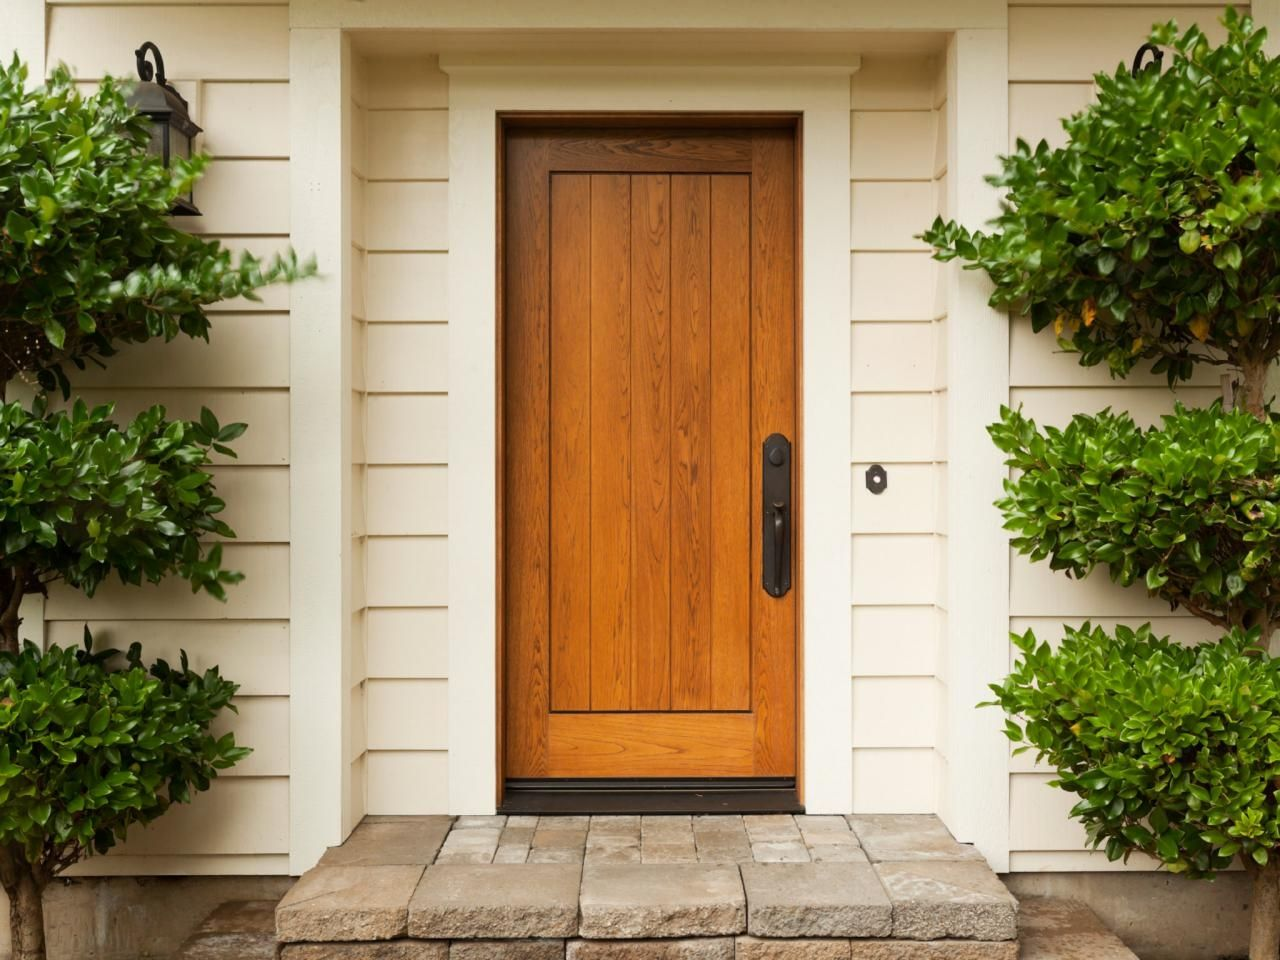 Small Insulated Exterior Doors | http://thefallguyediting.com ...